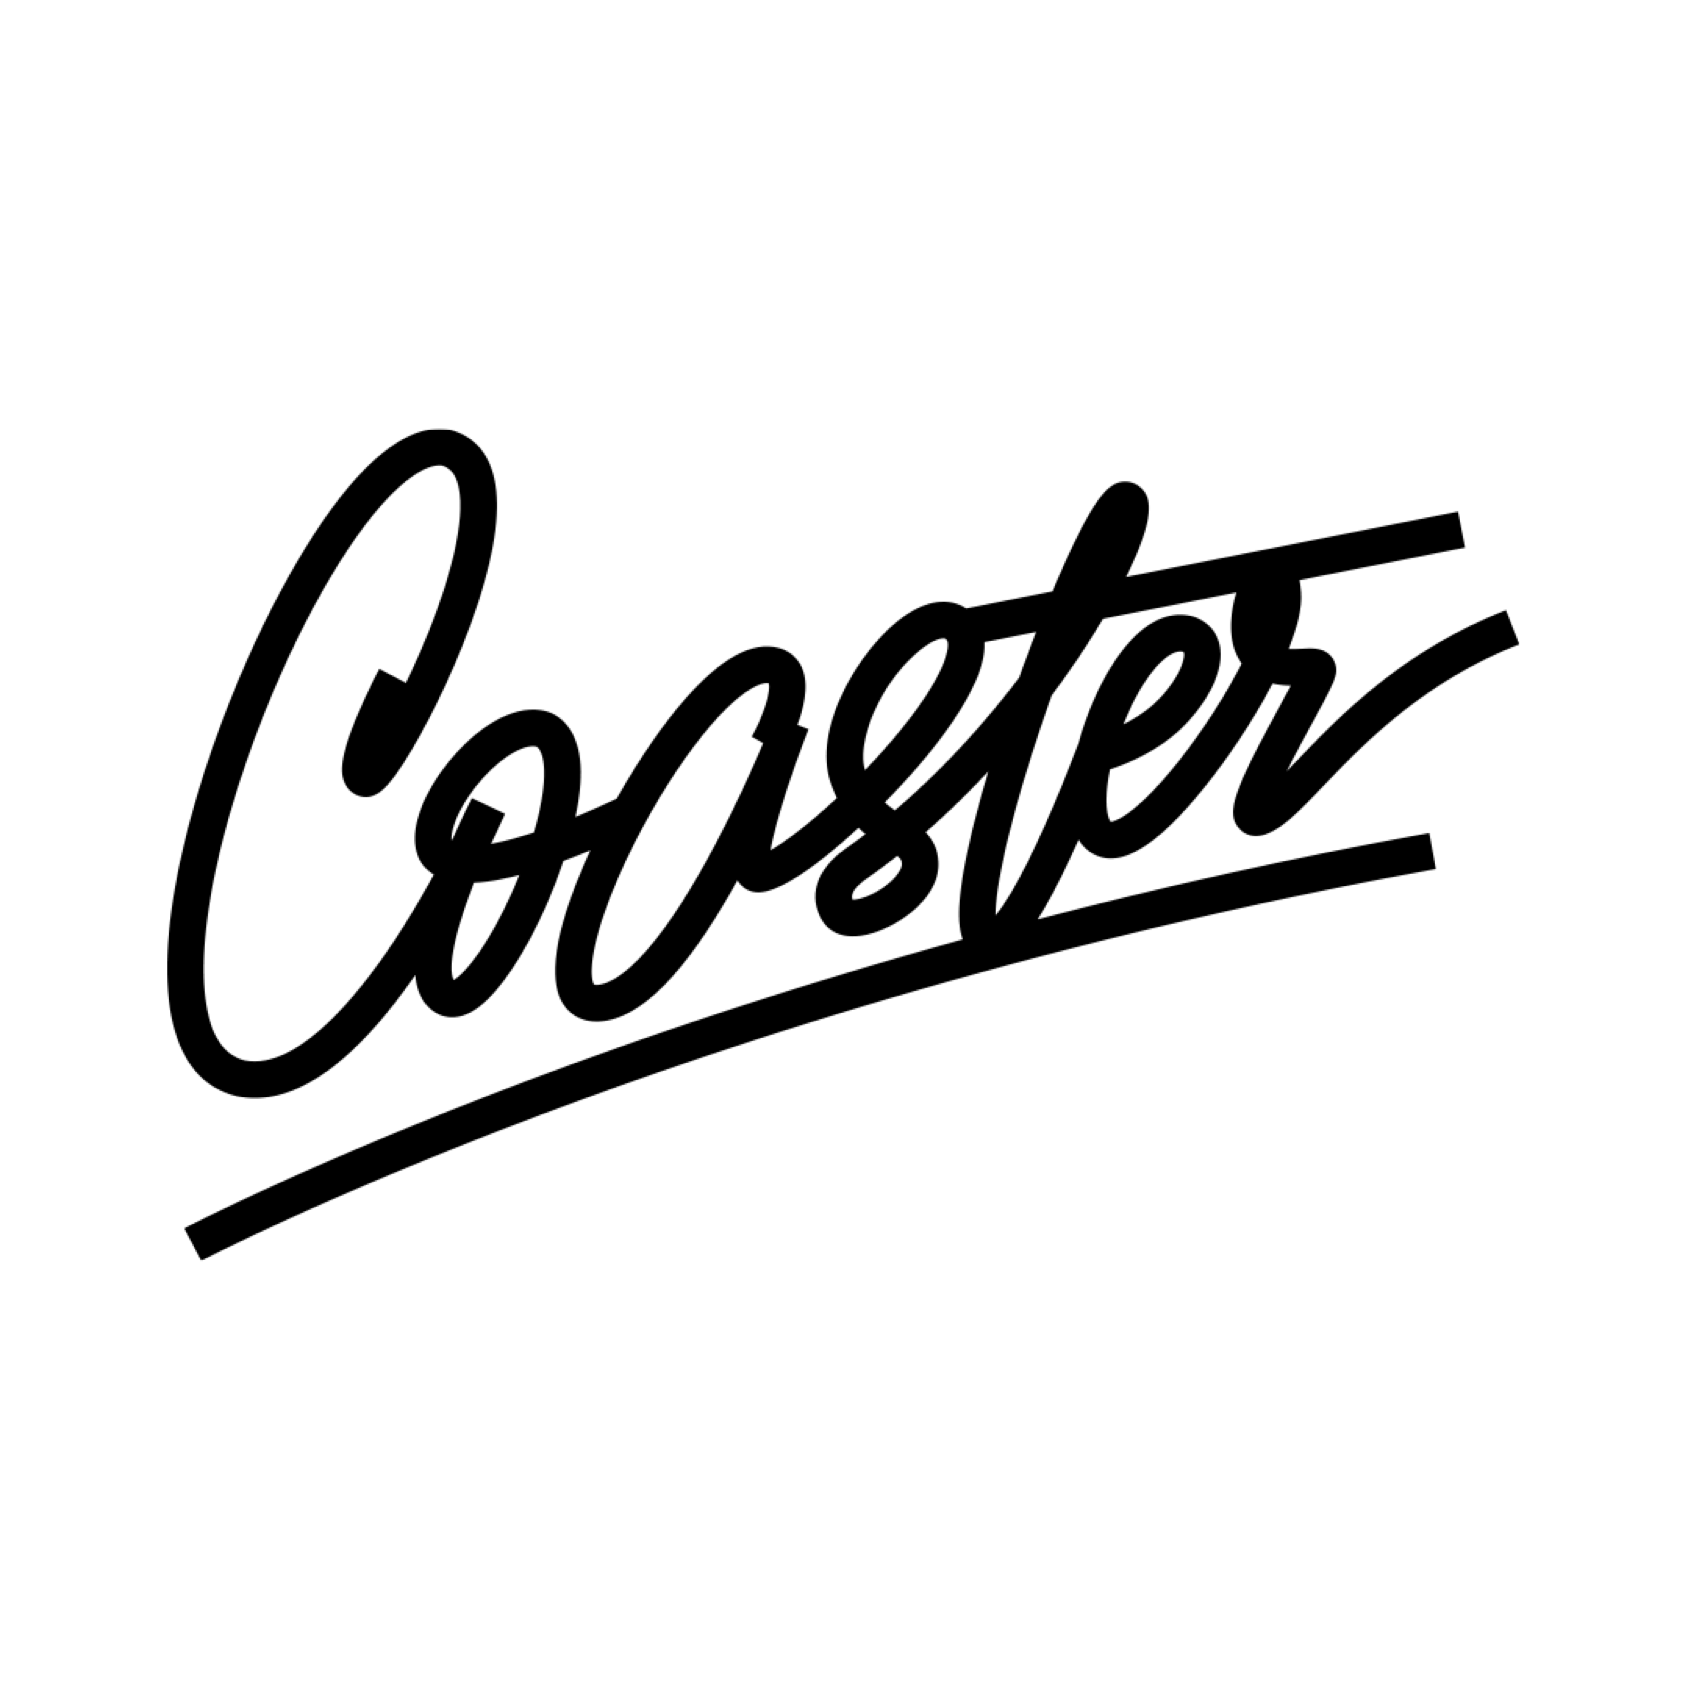 logo-beer-coaster.png